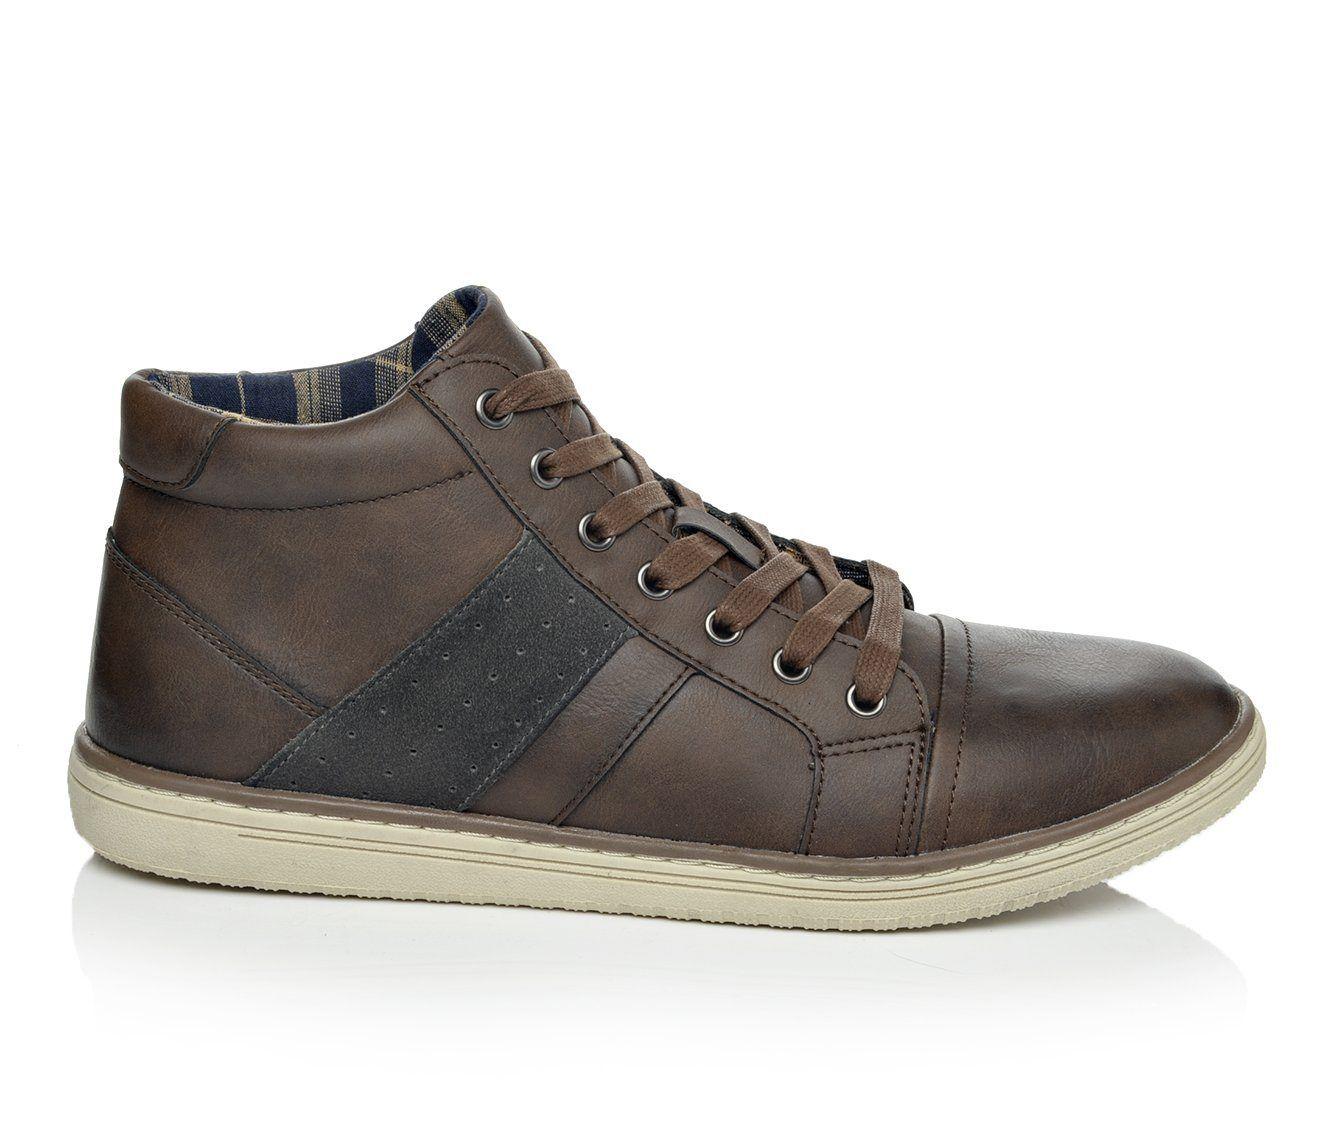 Men's Gotcha Finnega Sneakers